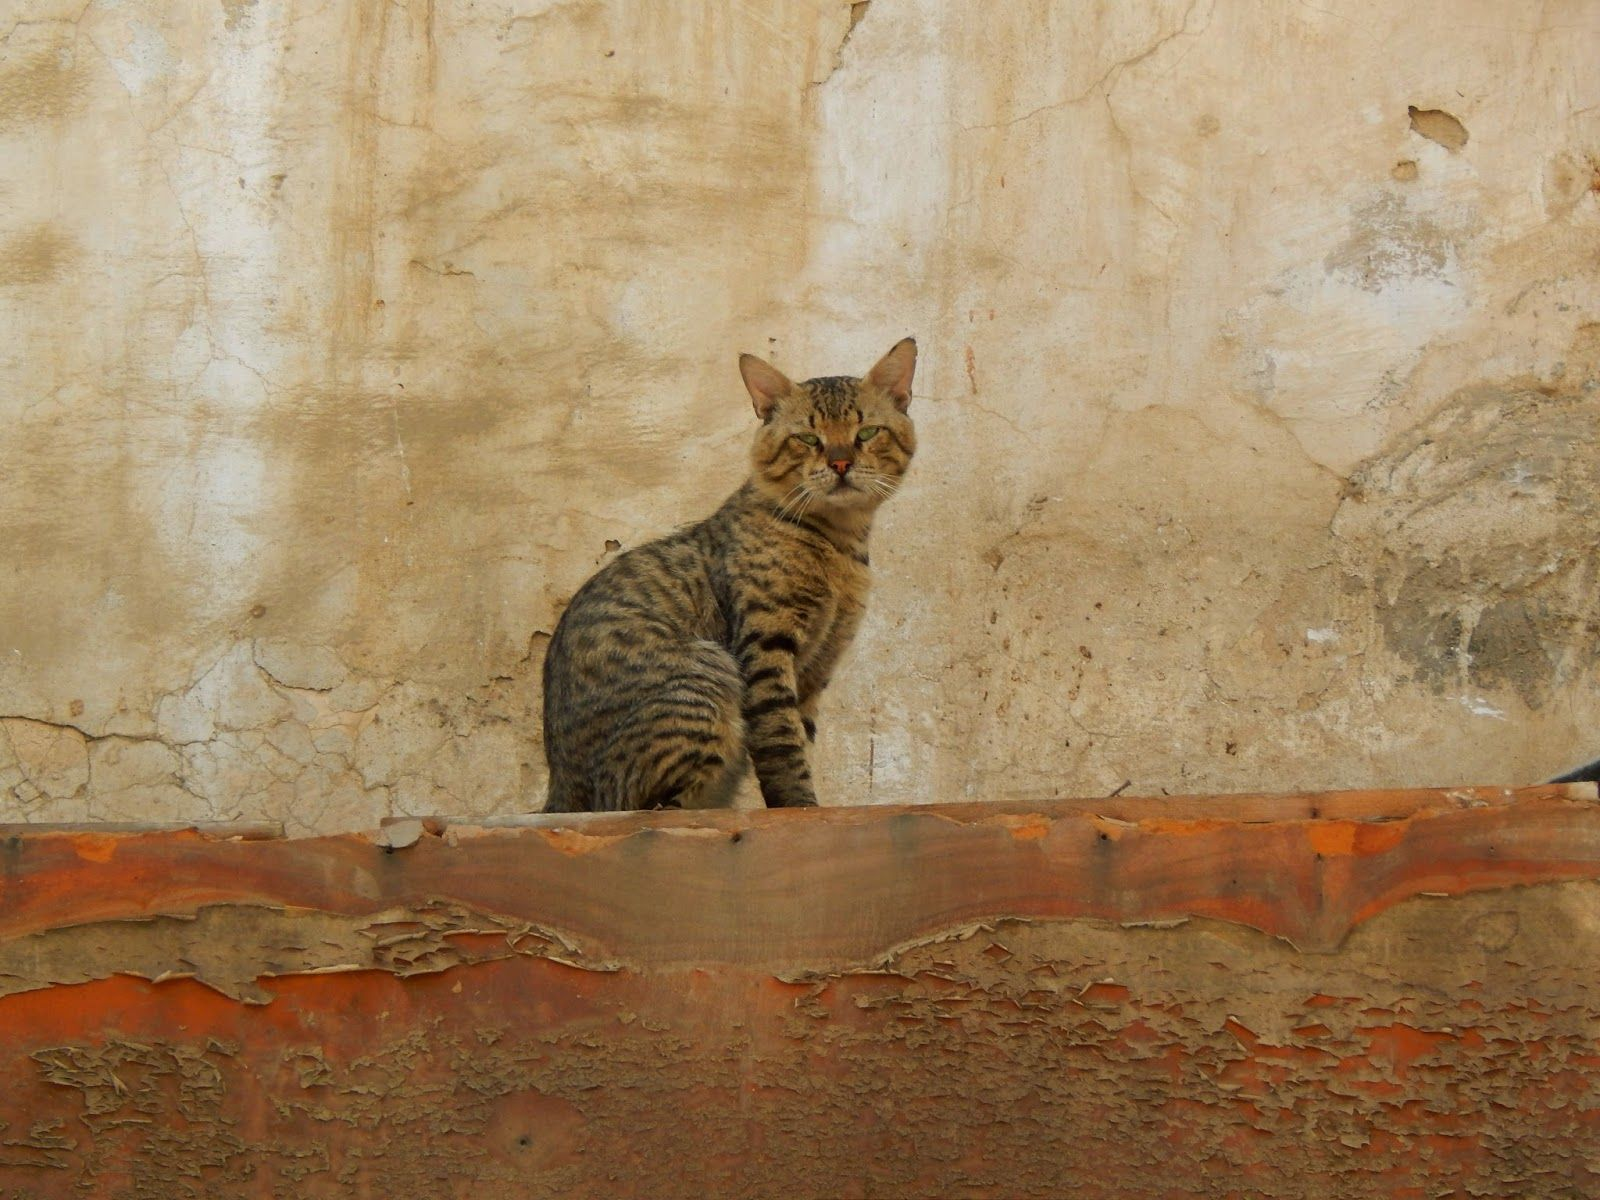 #cats #feline #jeddah #saudiarabia